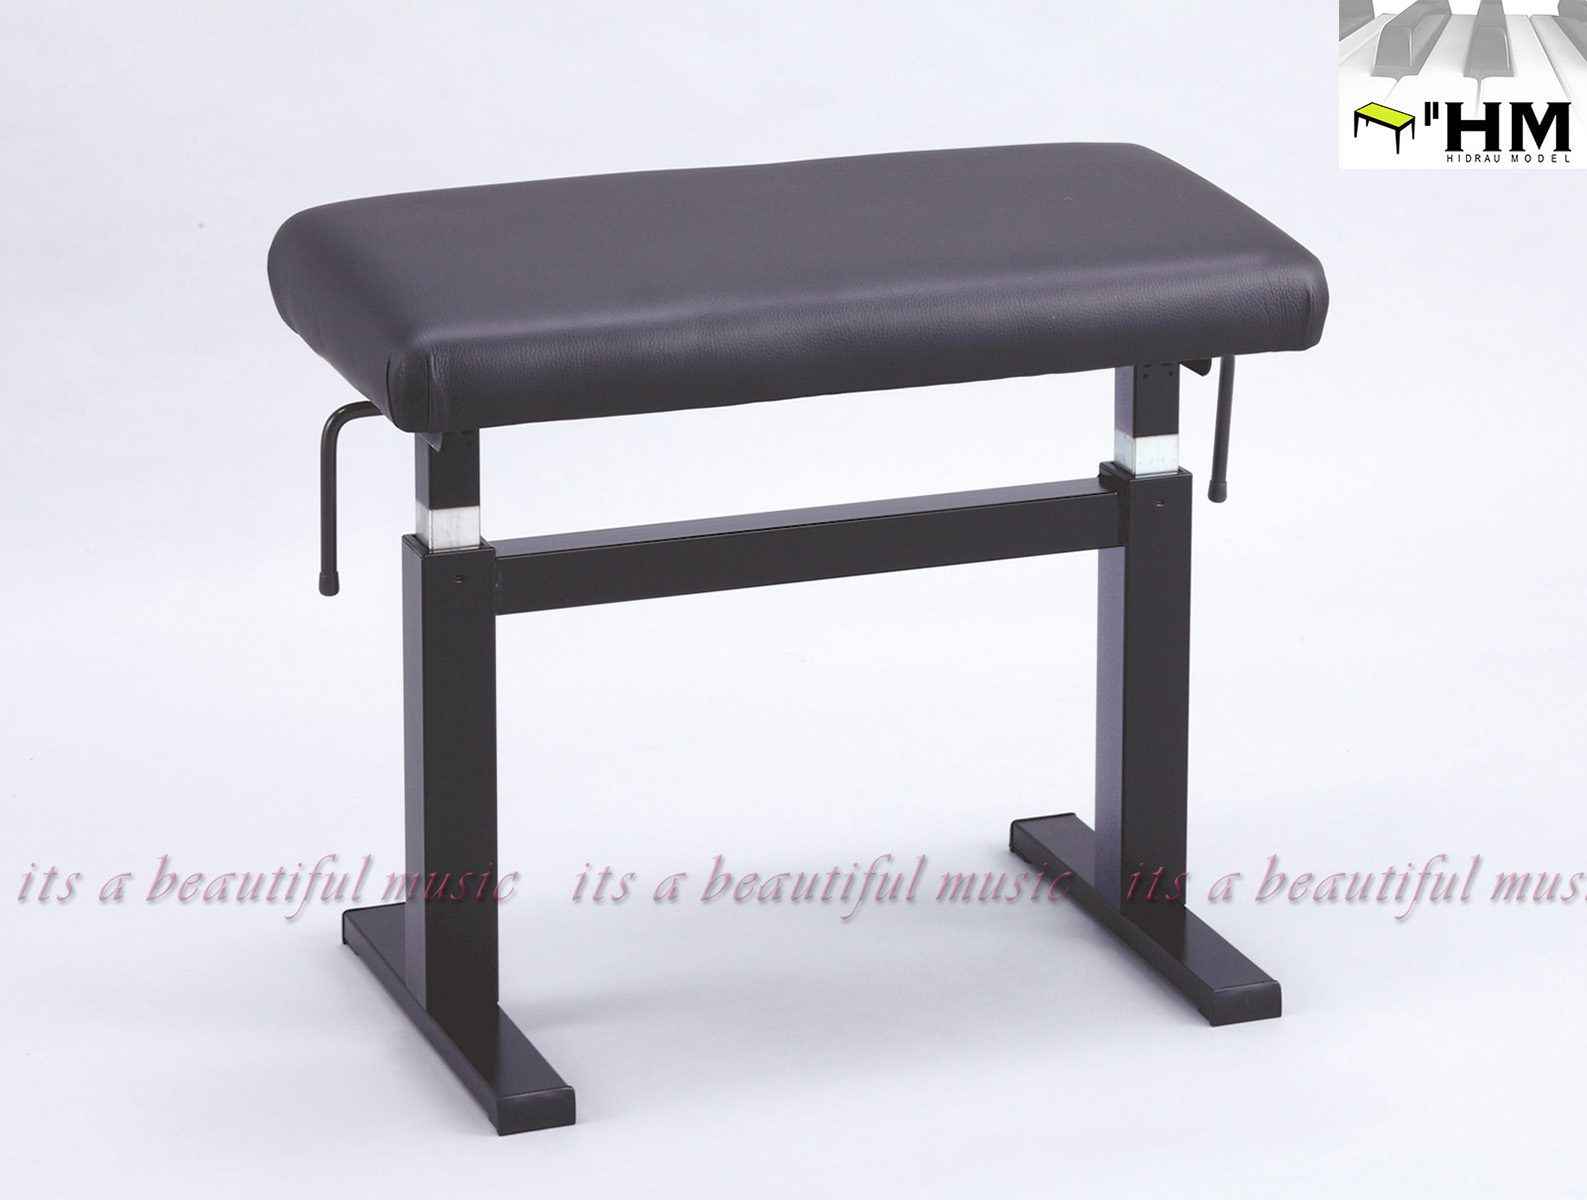 【its】スペイン/HIDRAU社 ガススプリング式高級輸入ピアノ椅子 BM-44H